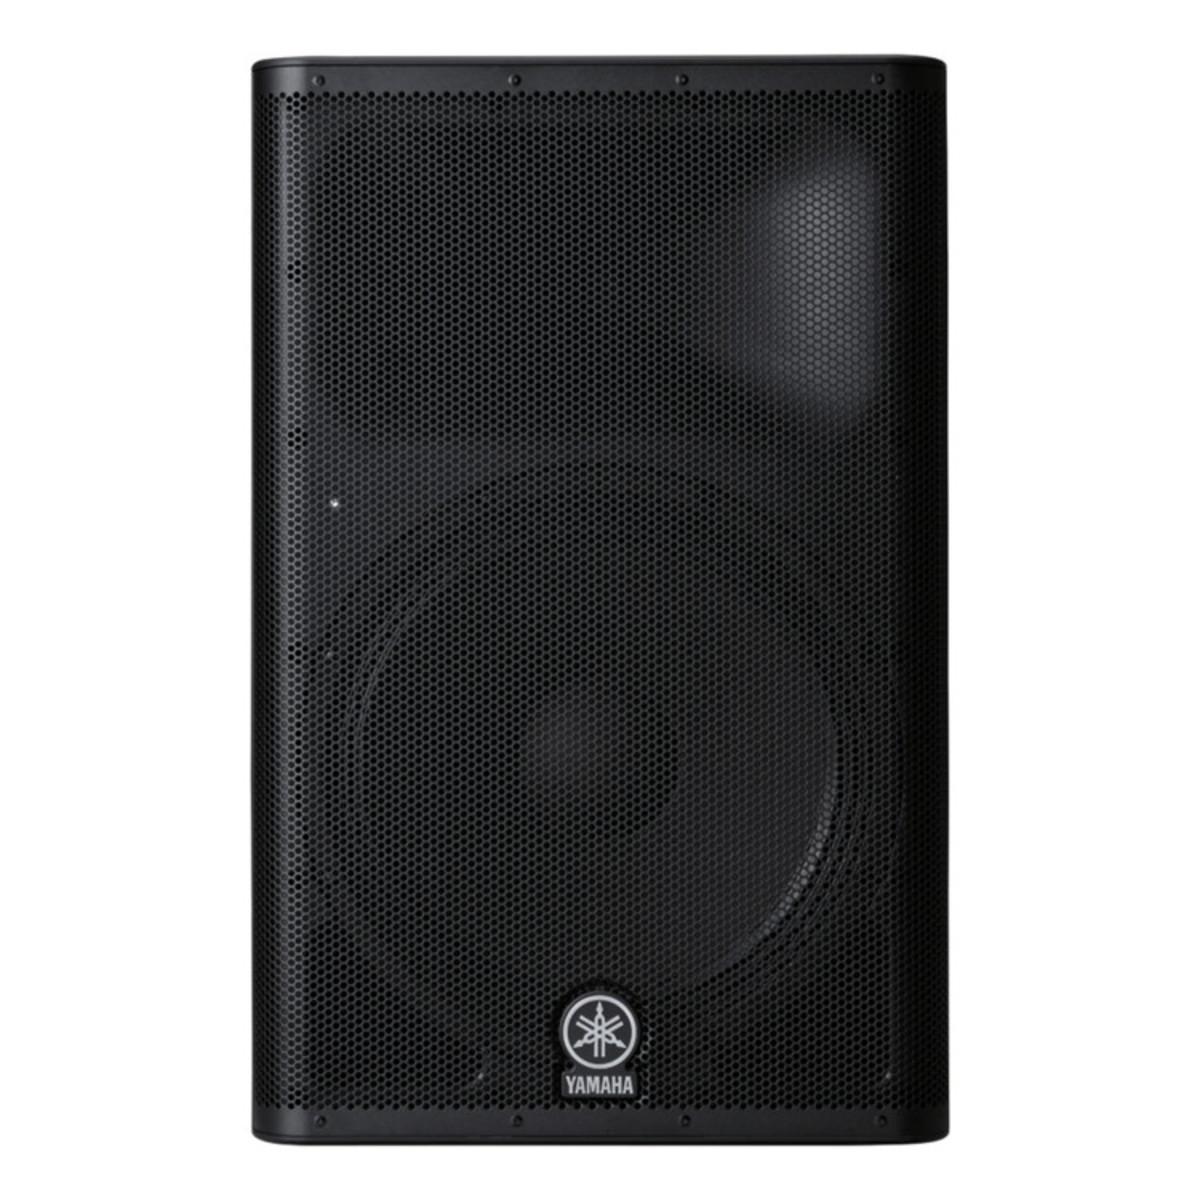 Yamaha dxr15 15 2 way active loudspeaker nearly new at for Yamaha dj speaker